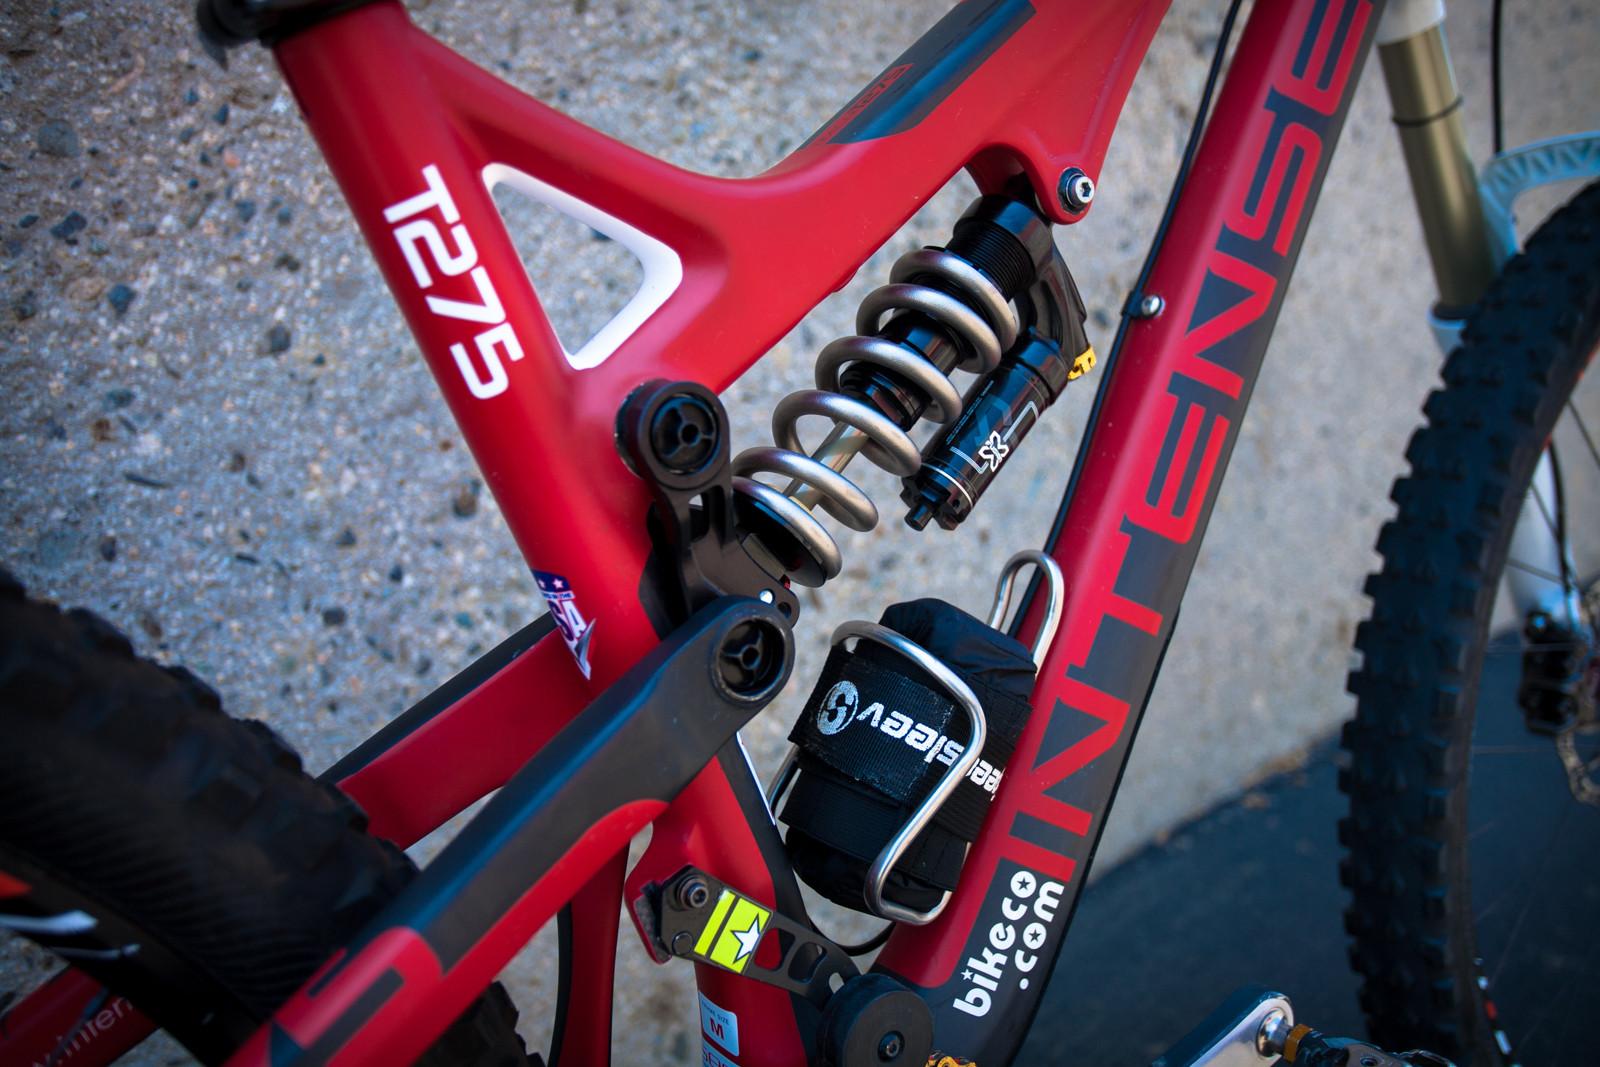 Brian Lopes' Intense Tracer T275 - Pro Bike Check: Brian Lopes' Intense Tracer T275 - Mountain Biking Pictures - Vital MTB